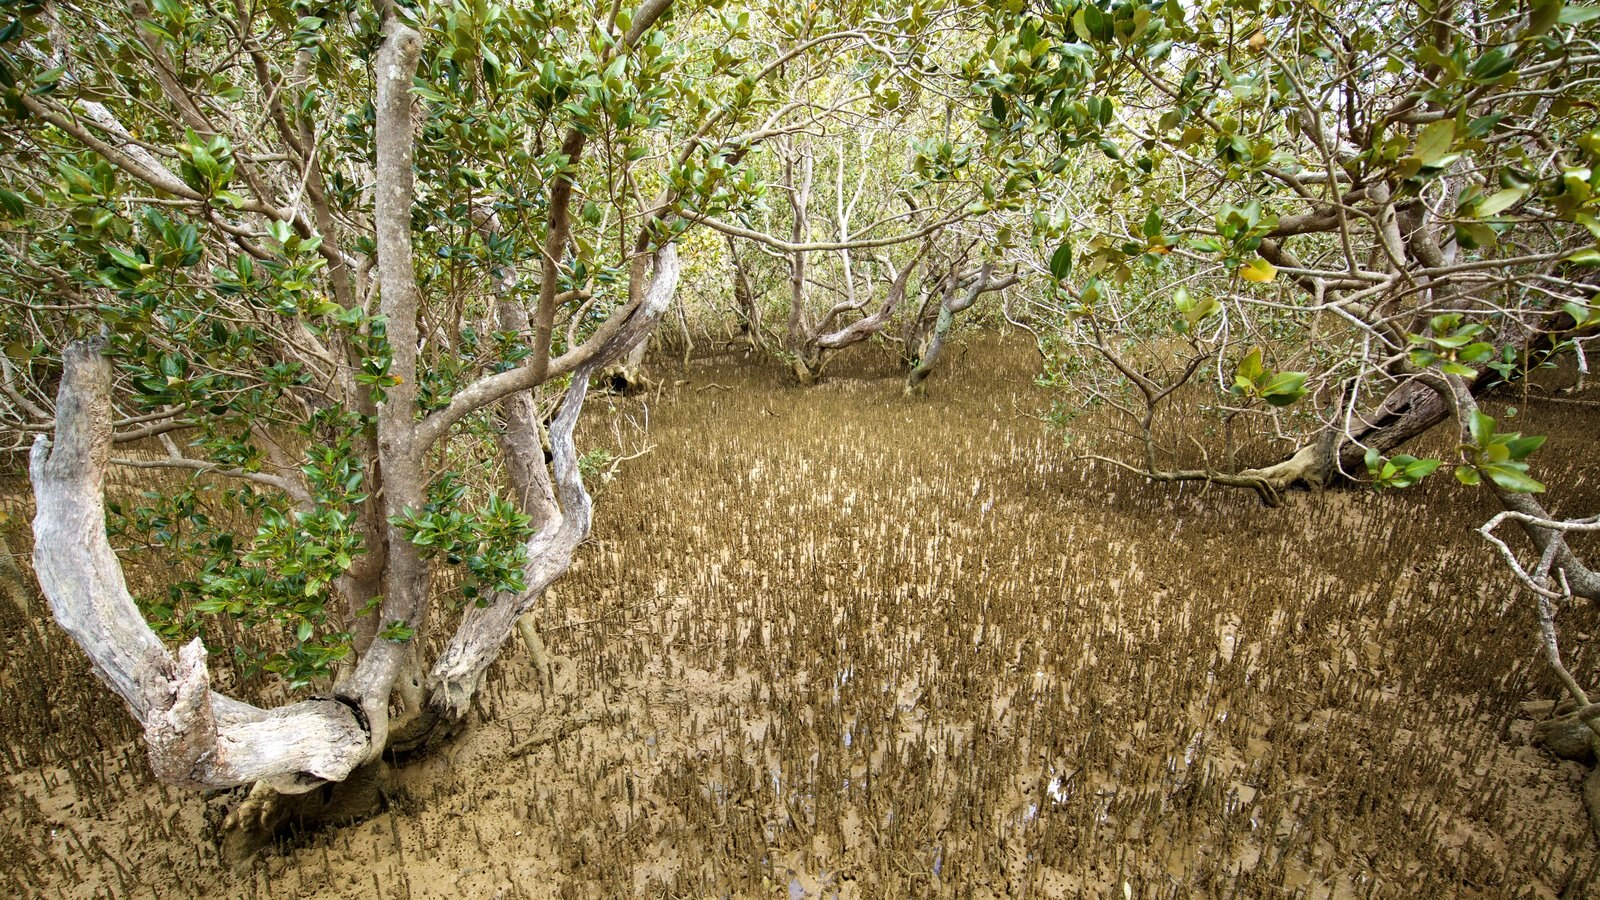 Paihia que incluye manglares